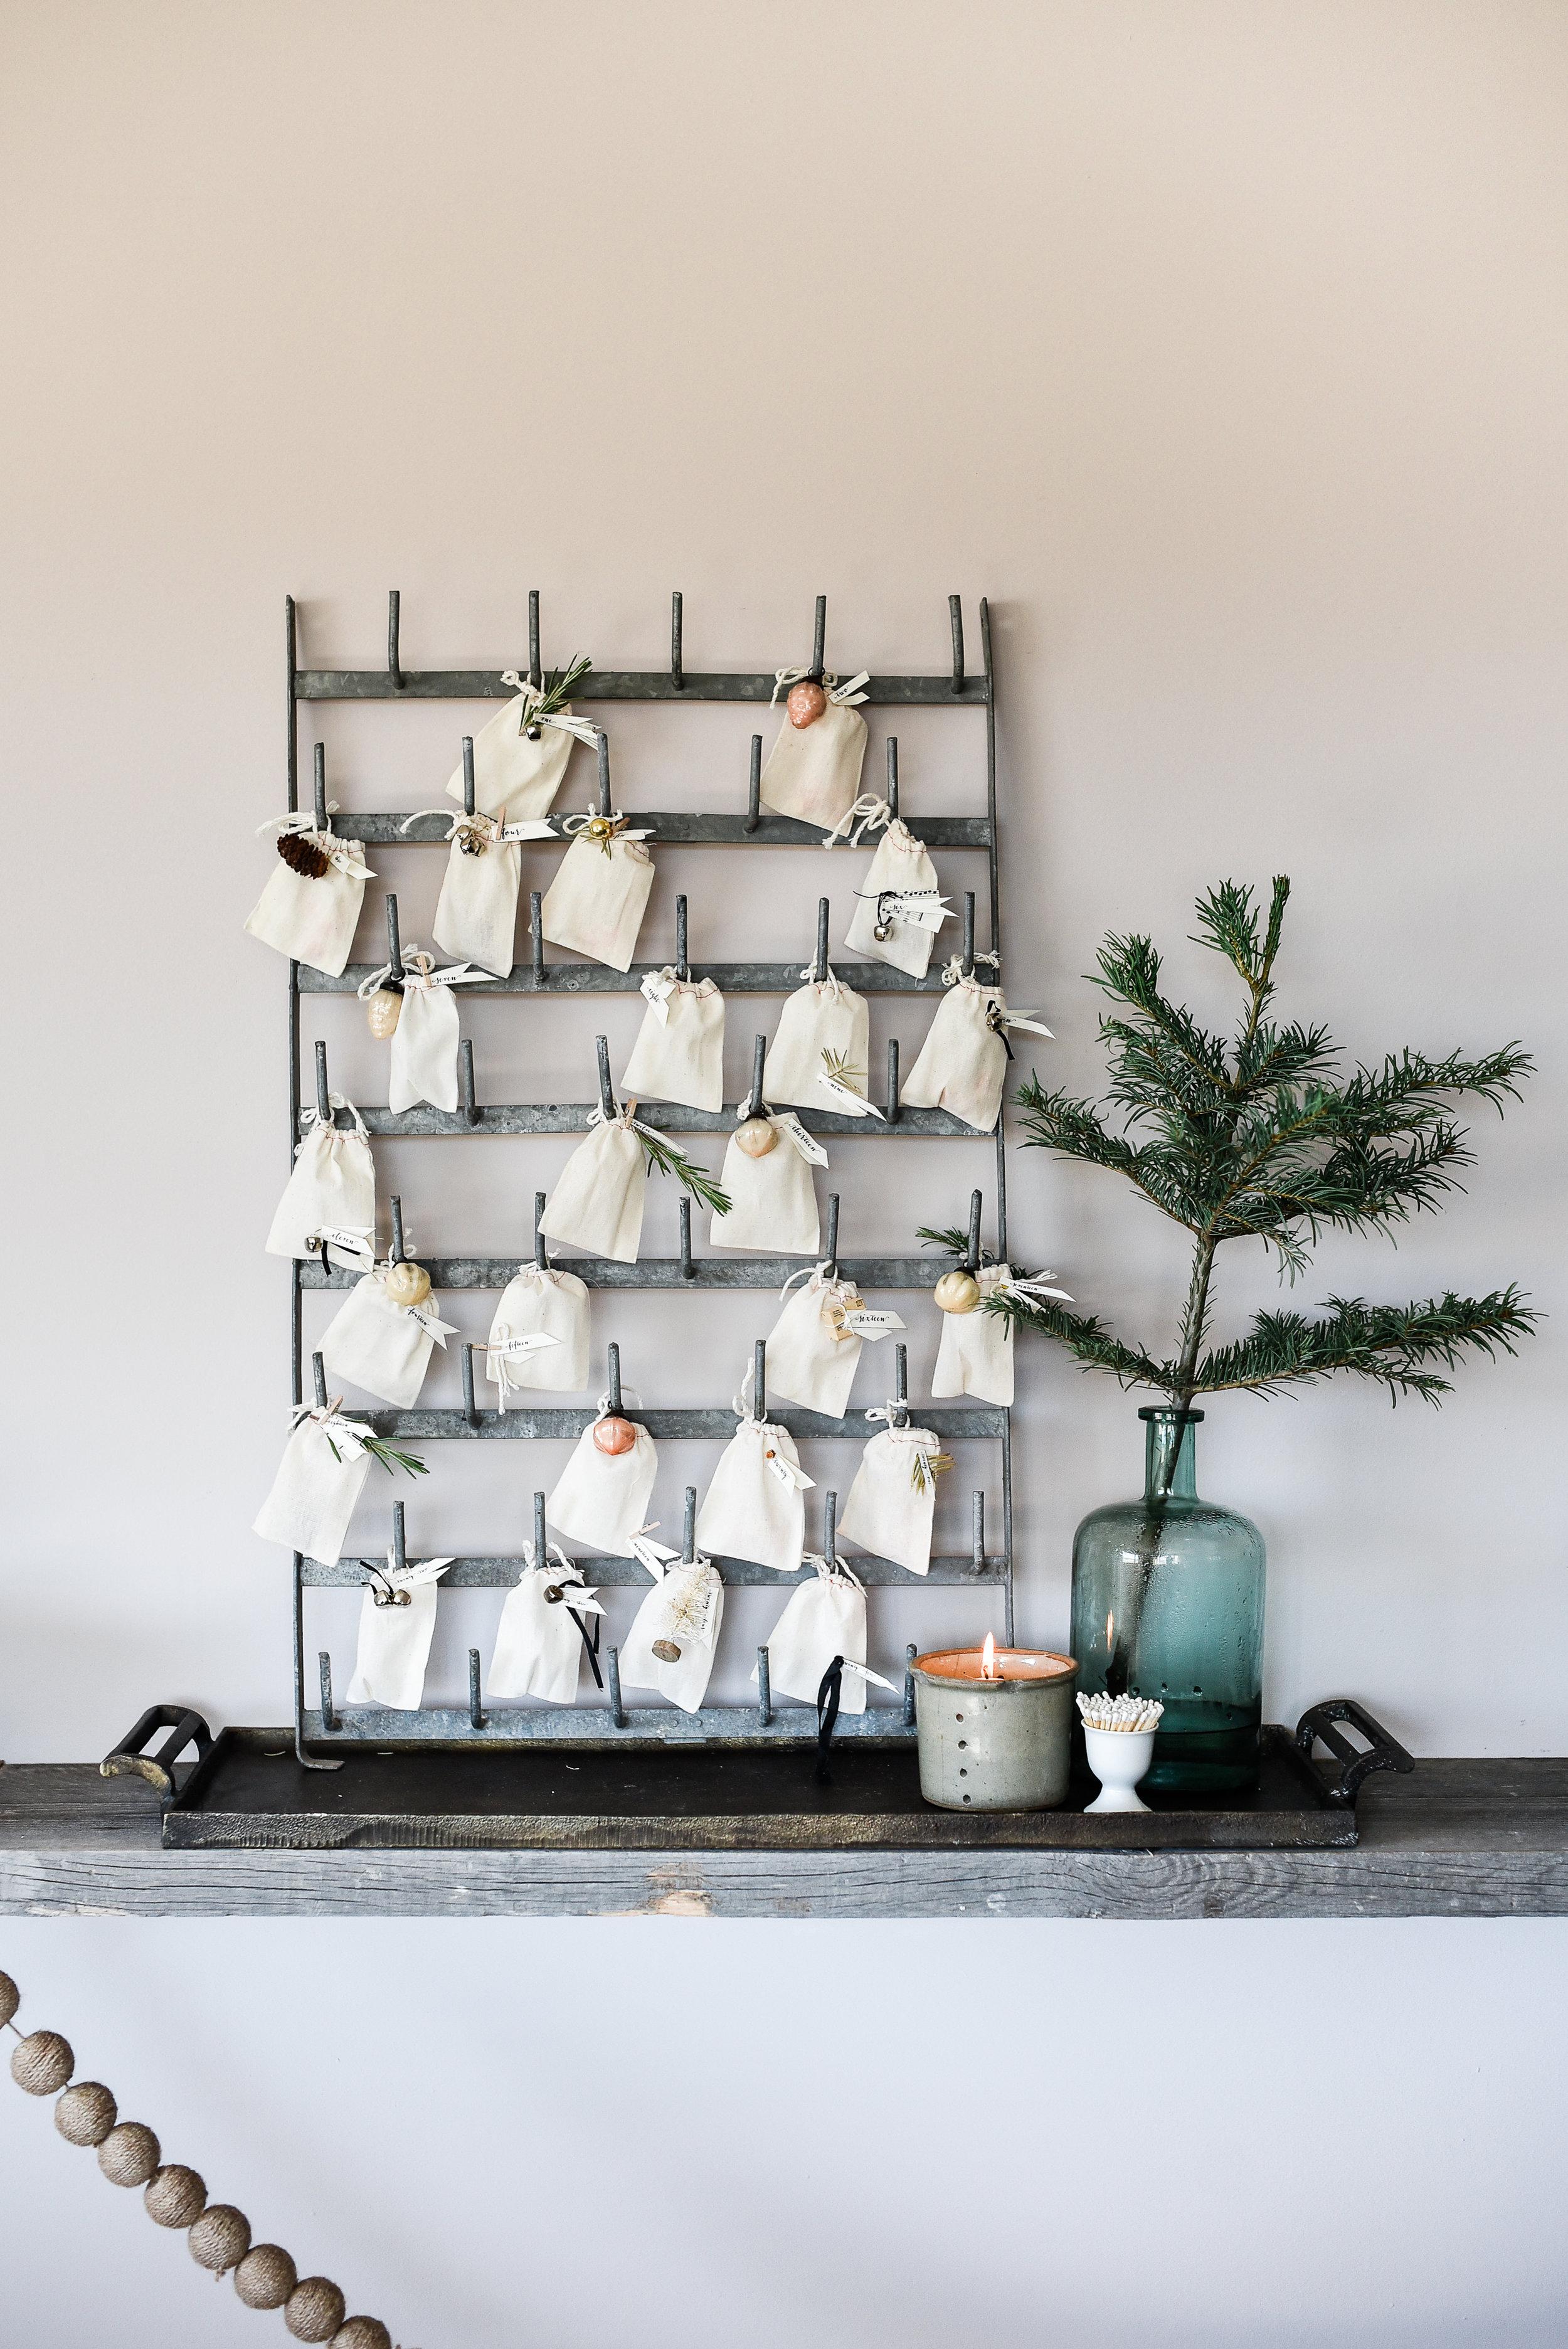 DIY Christmas Advent Calendar ideas from boxwoodavenue.com | #farmhousechristmas #christmasdecorating